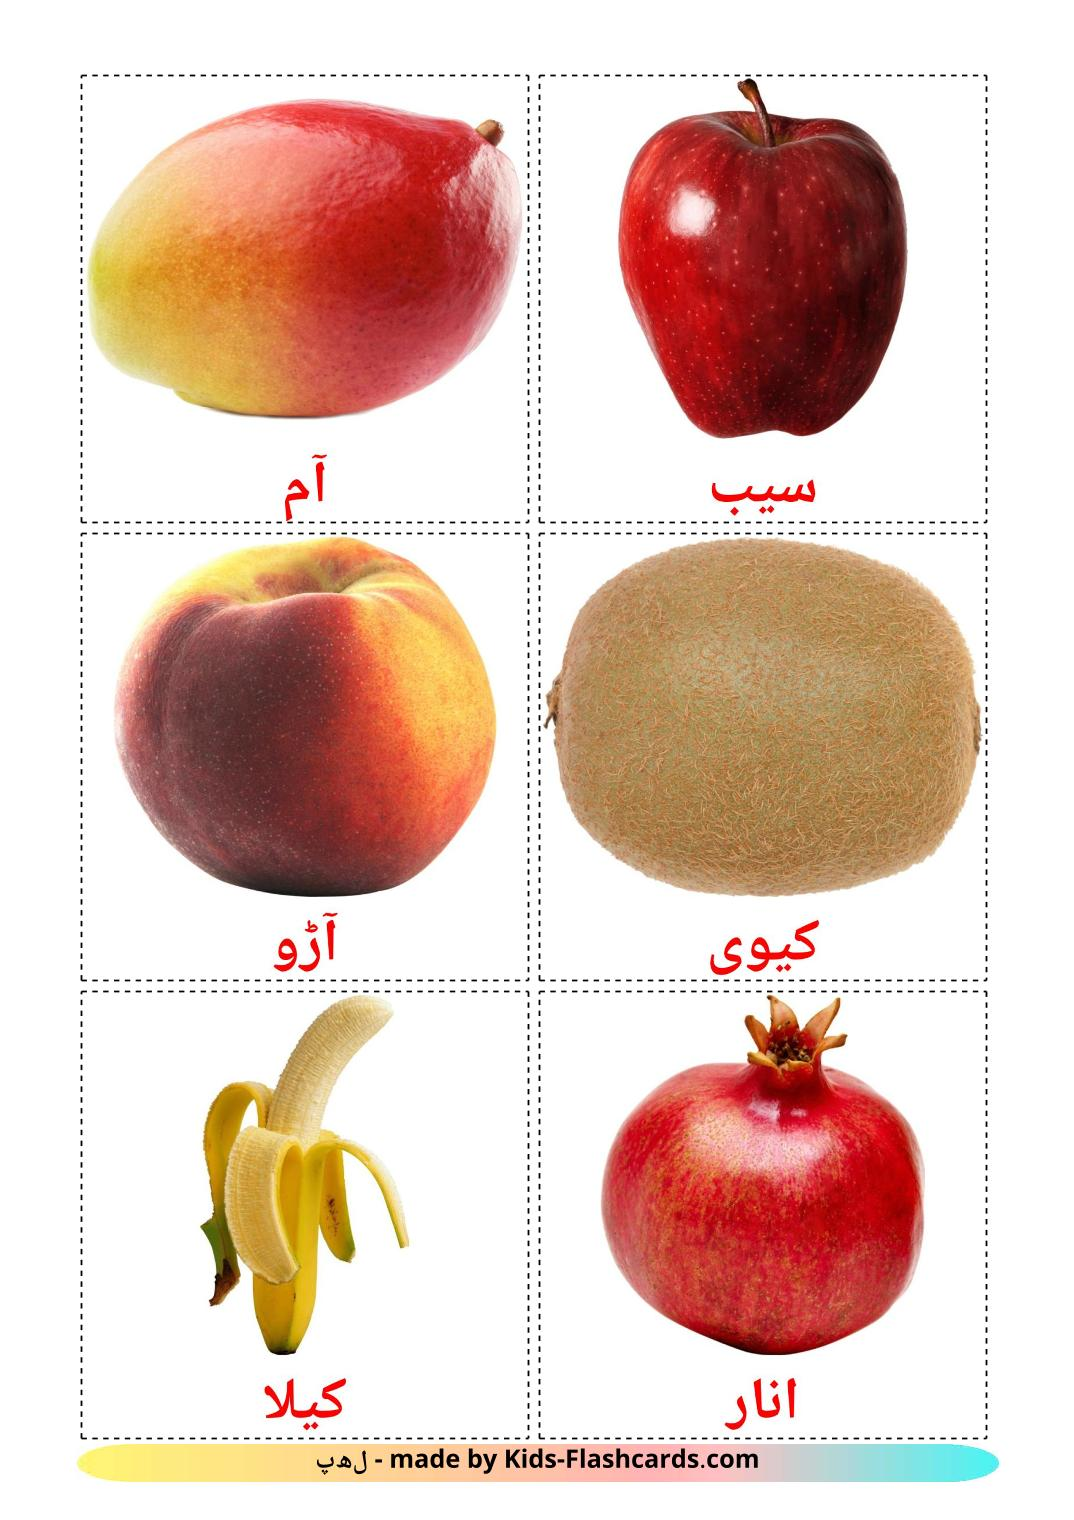 Fruits - 20 Free Printable urdu Flashcards